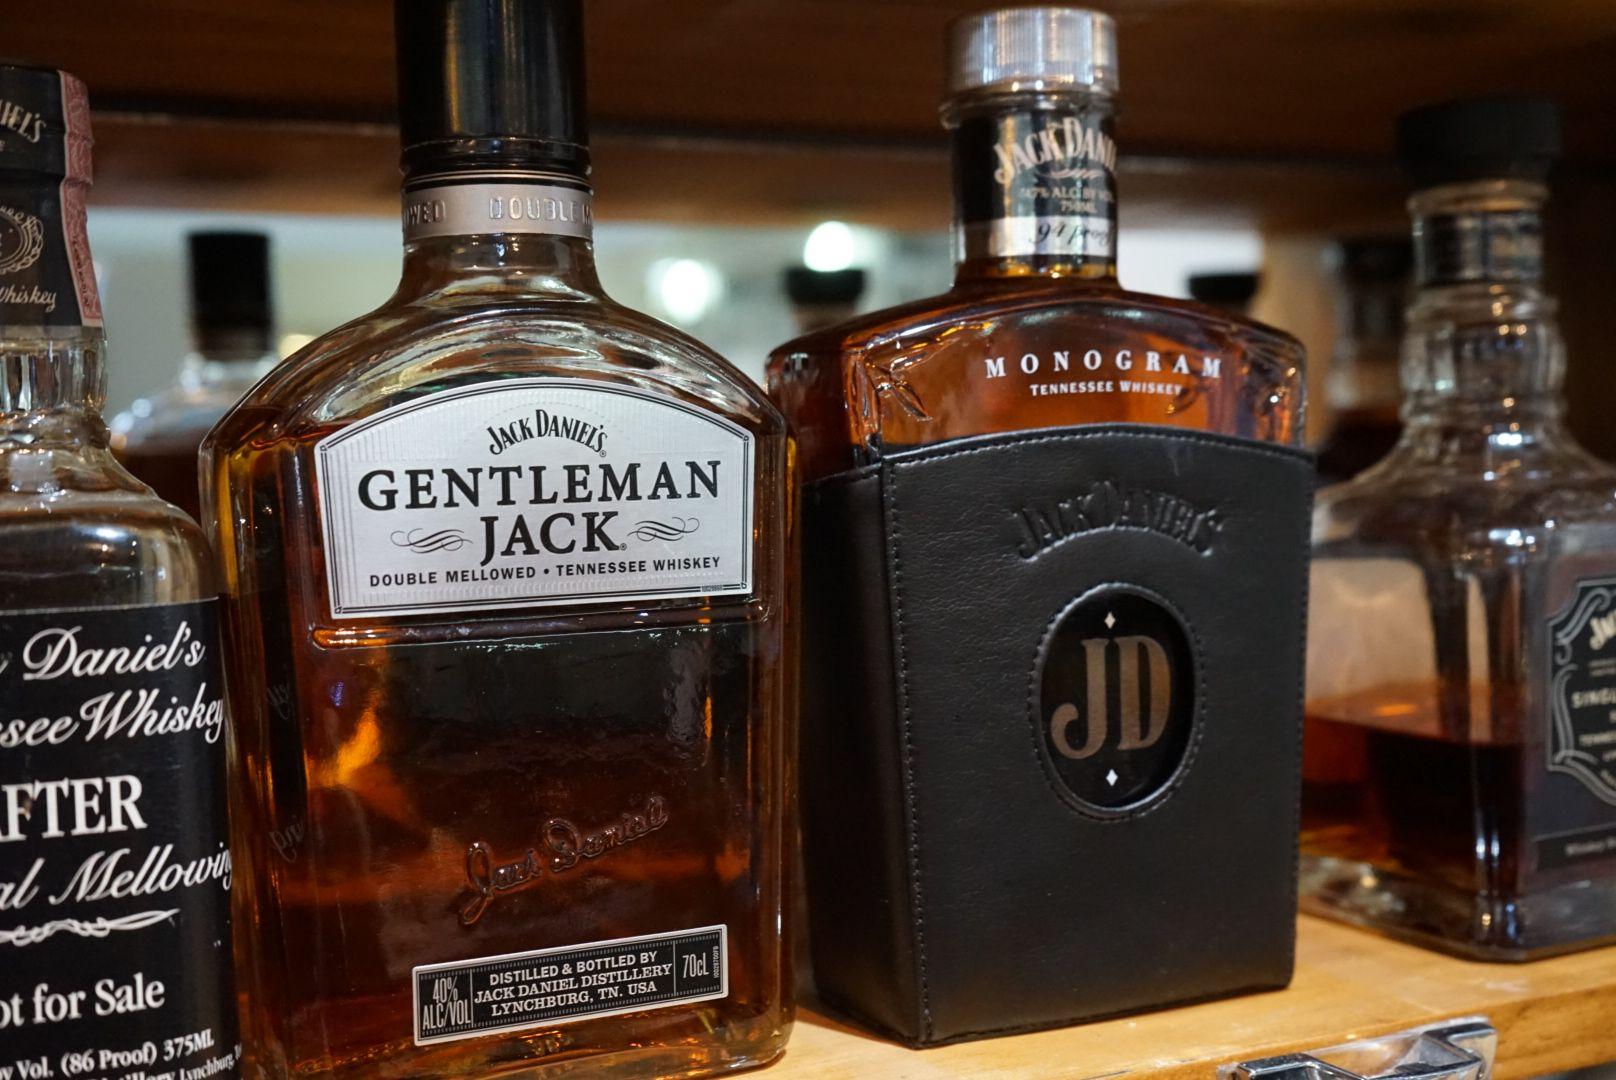 What You Need To Know Gentleman Jack Exhibits Impressive